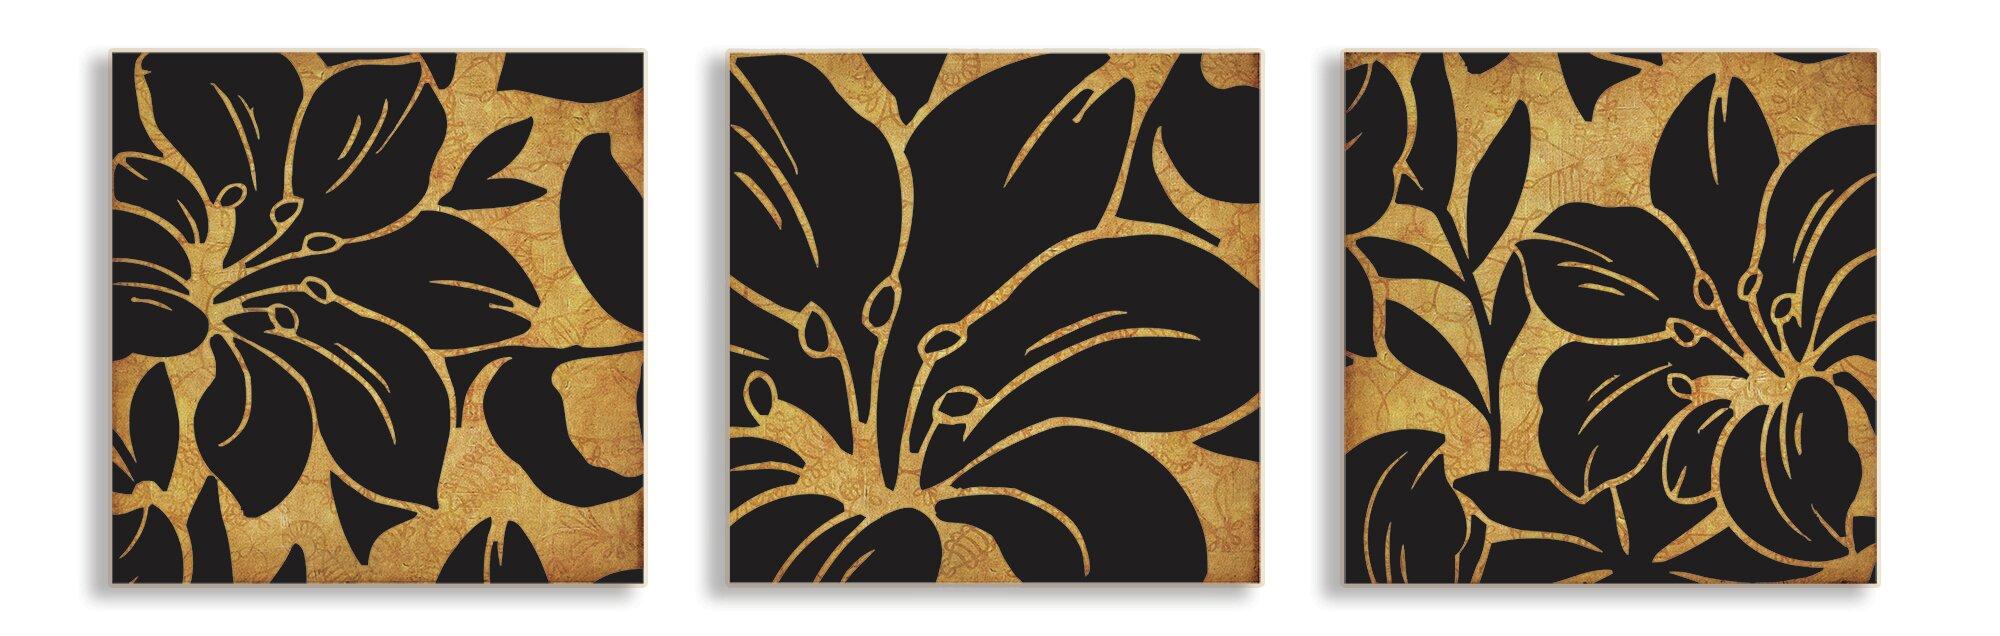 3 Piece Canvas Wall Art Sets stupell industries floral print 3 piece canvas wall art set | wayfair